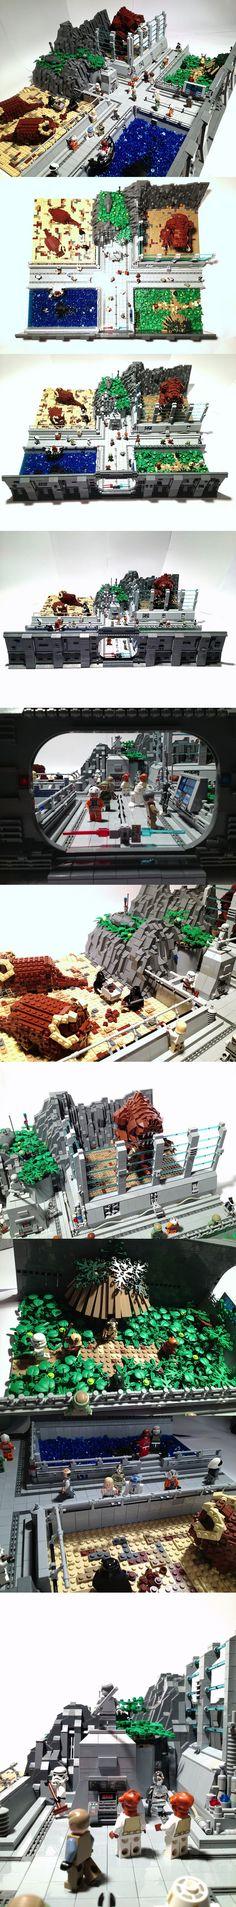 LEGO Star Wars Museum